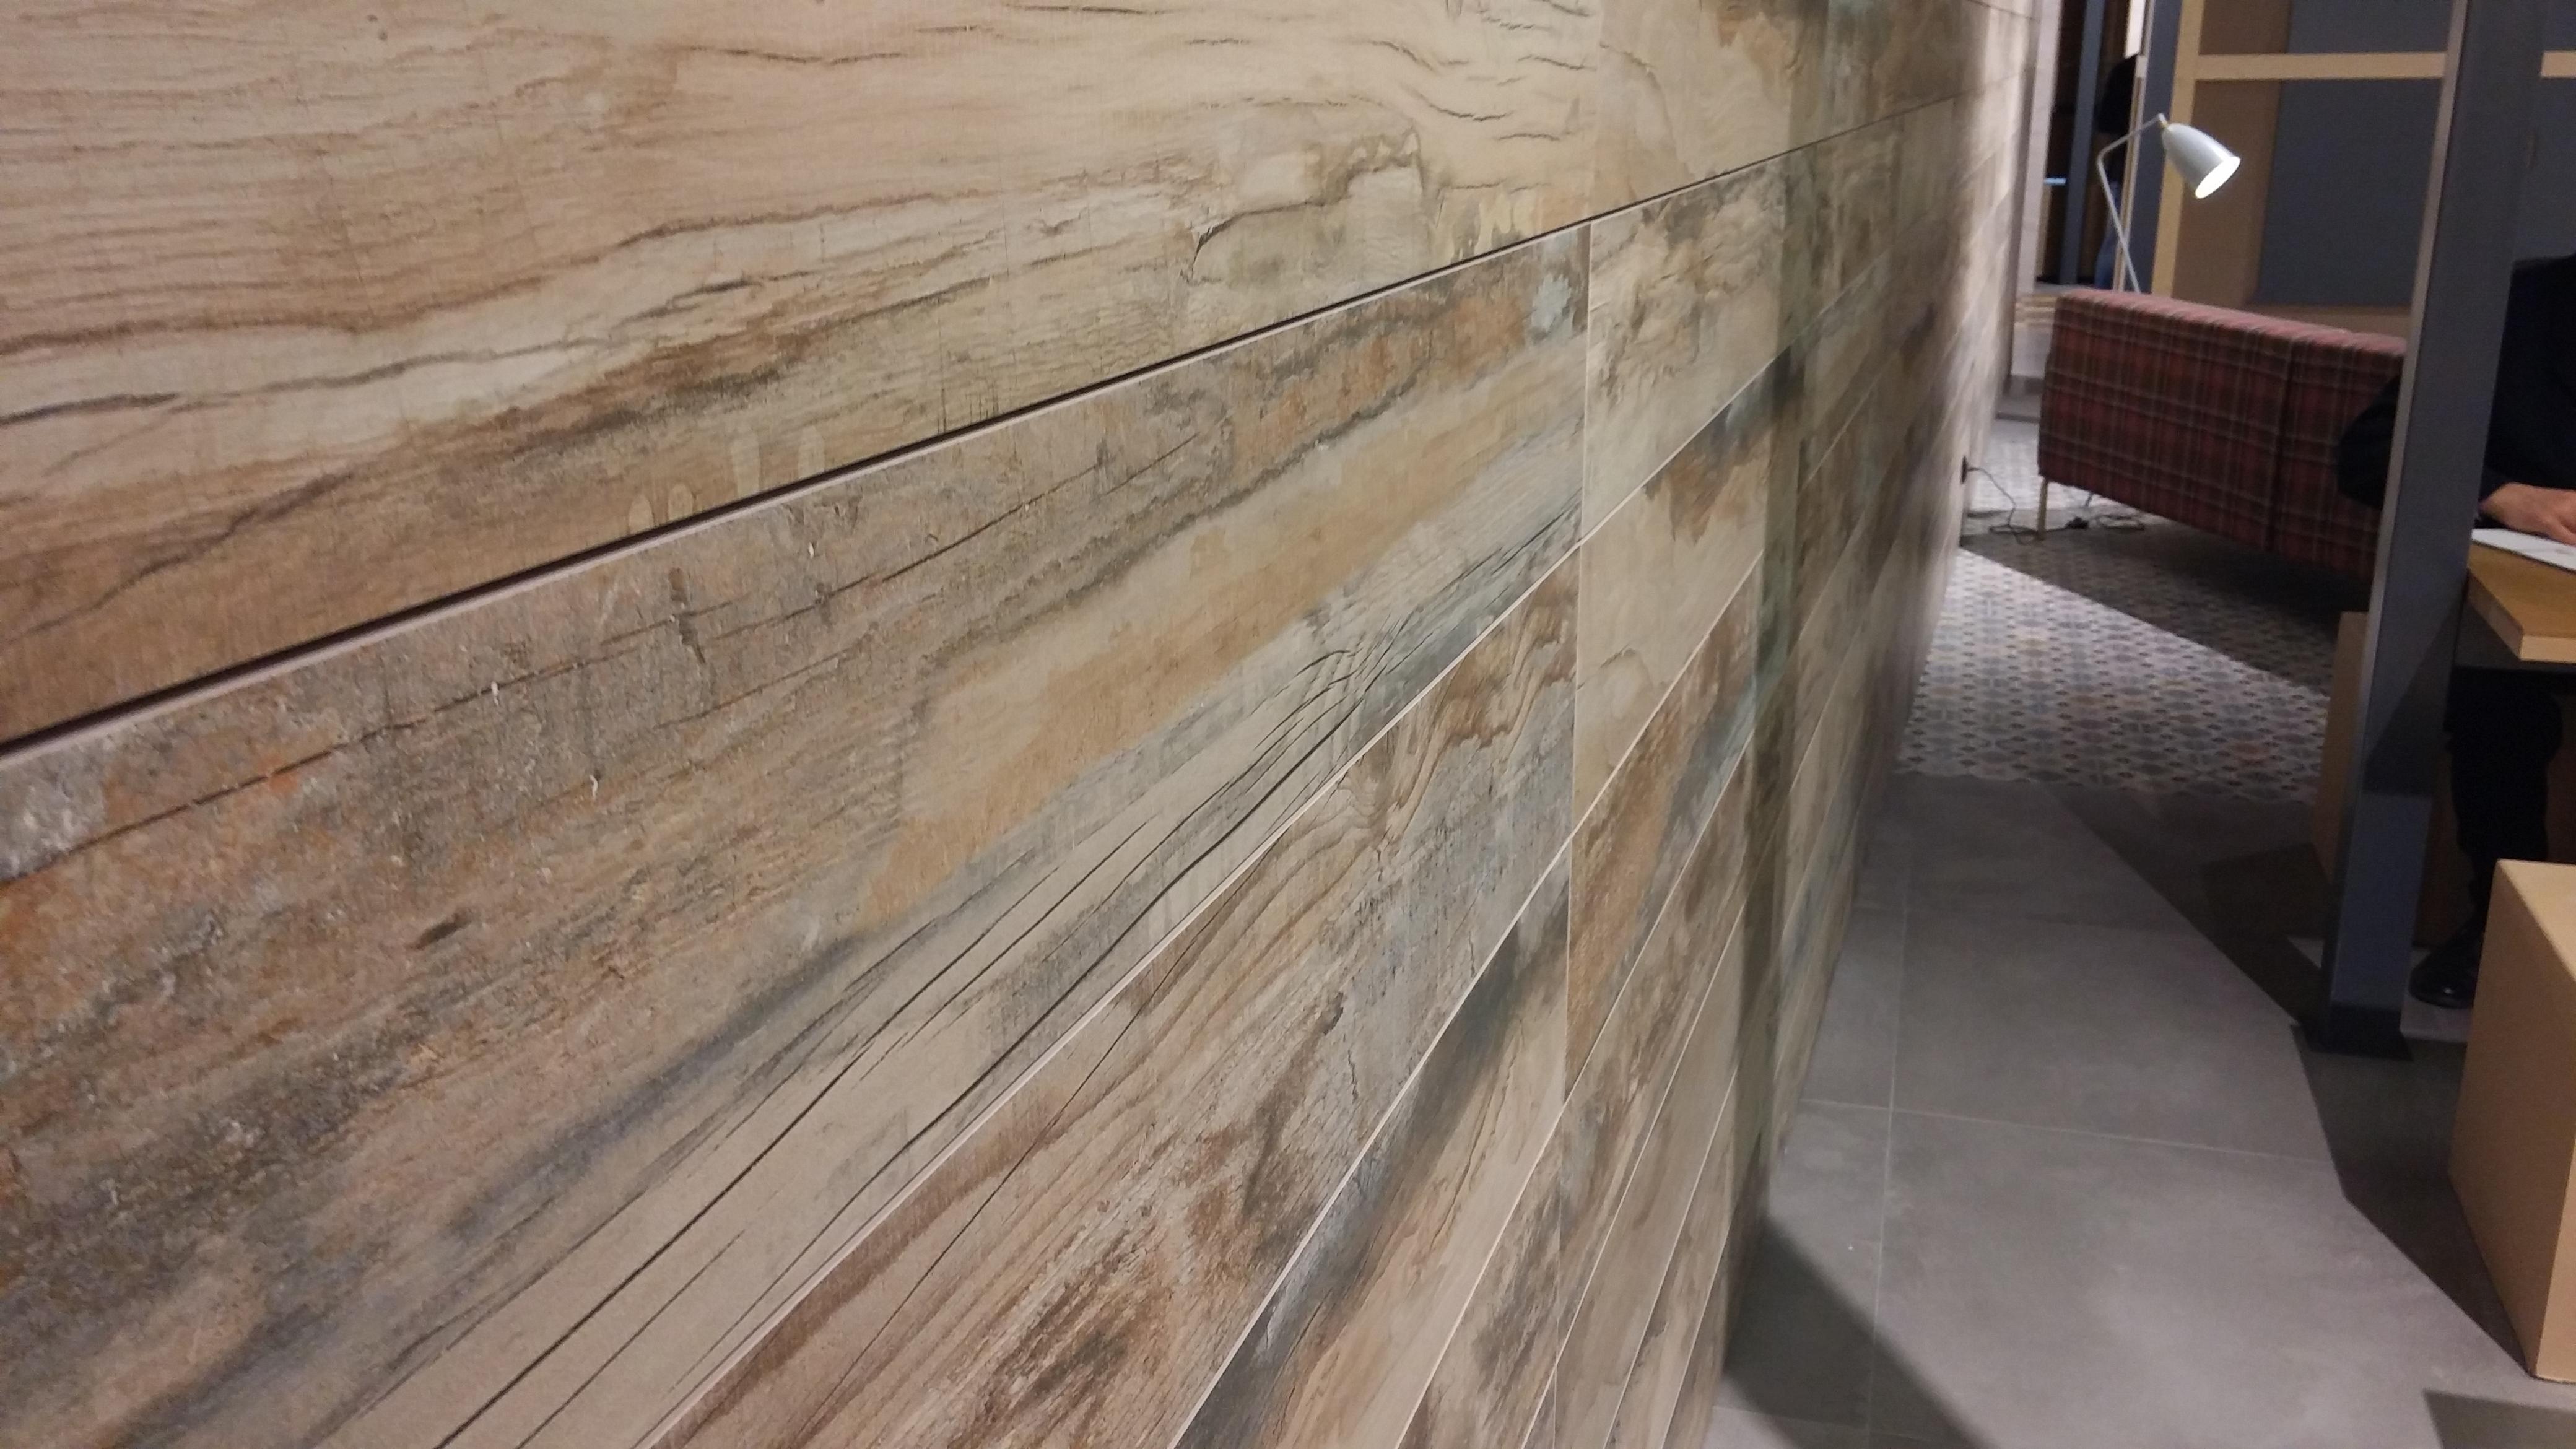 great azulejos bao imitacion madera tambin nos ofrecen imitacin madera para la pared azulejos bao imitacion madera with baldosa imitacion piedra - Baldosas Imitacion Madera